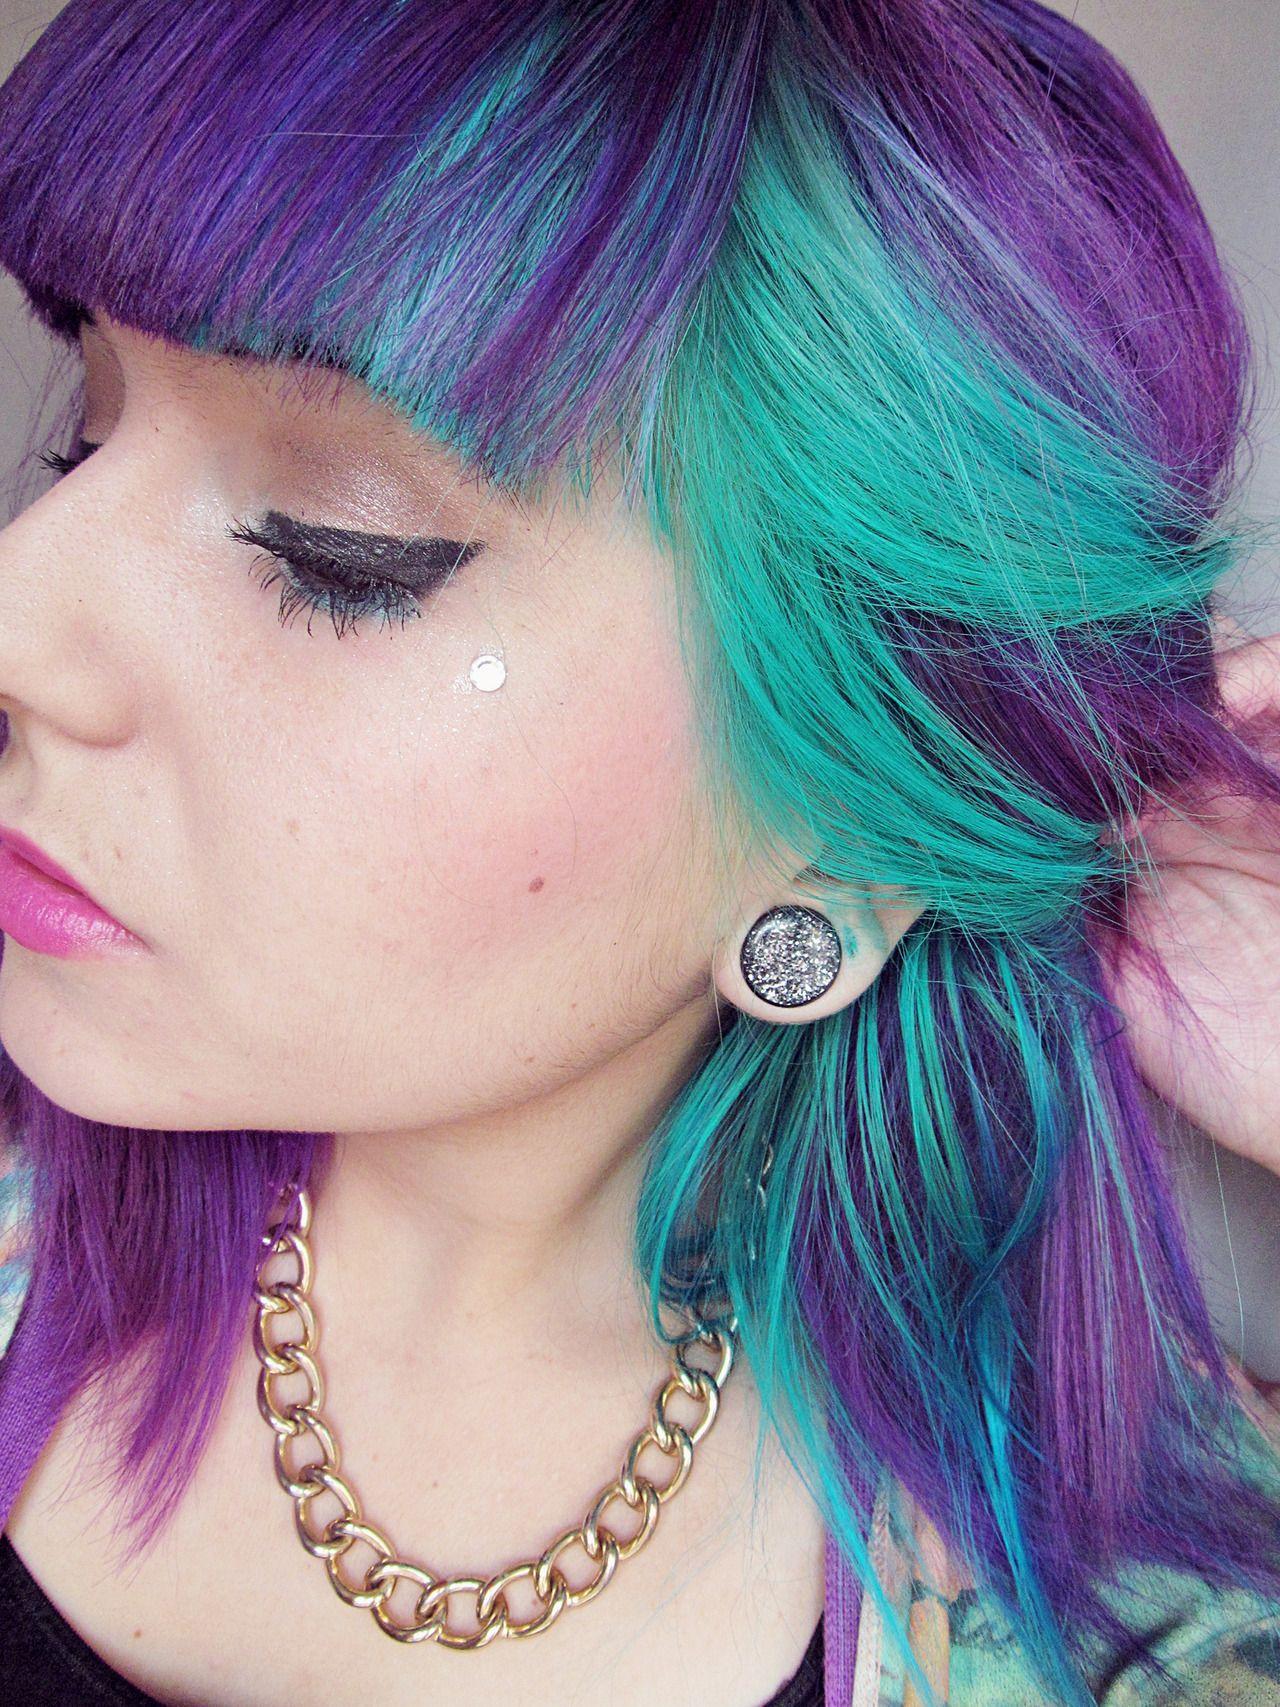 4oz special effects hair dye